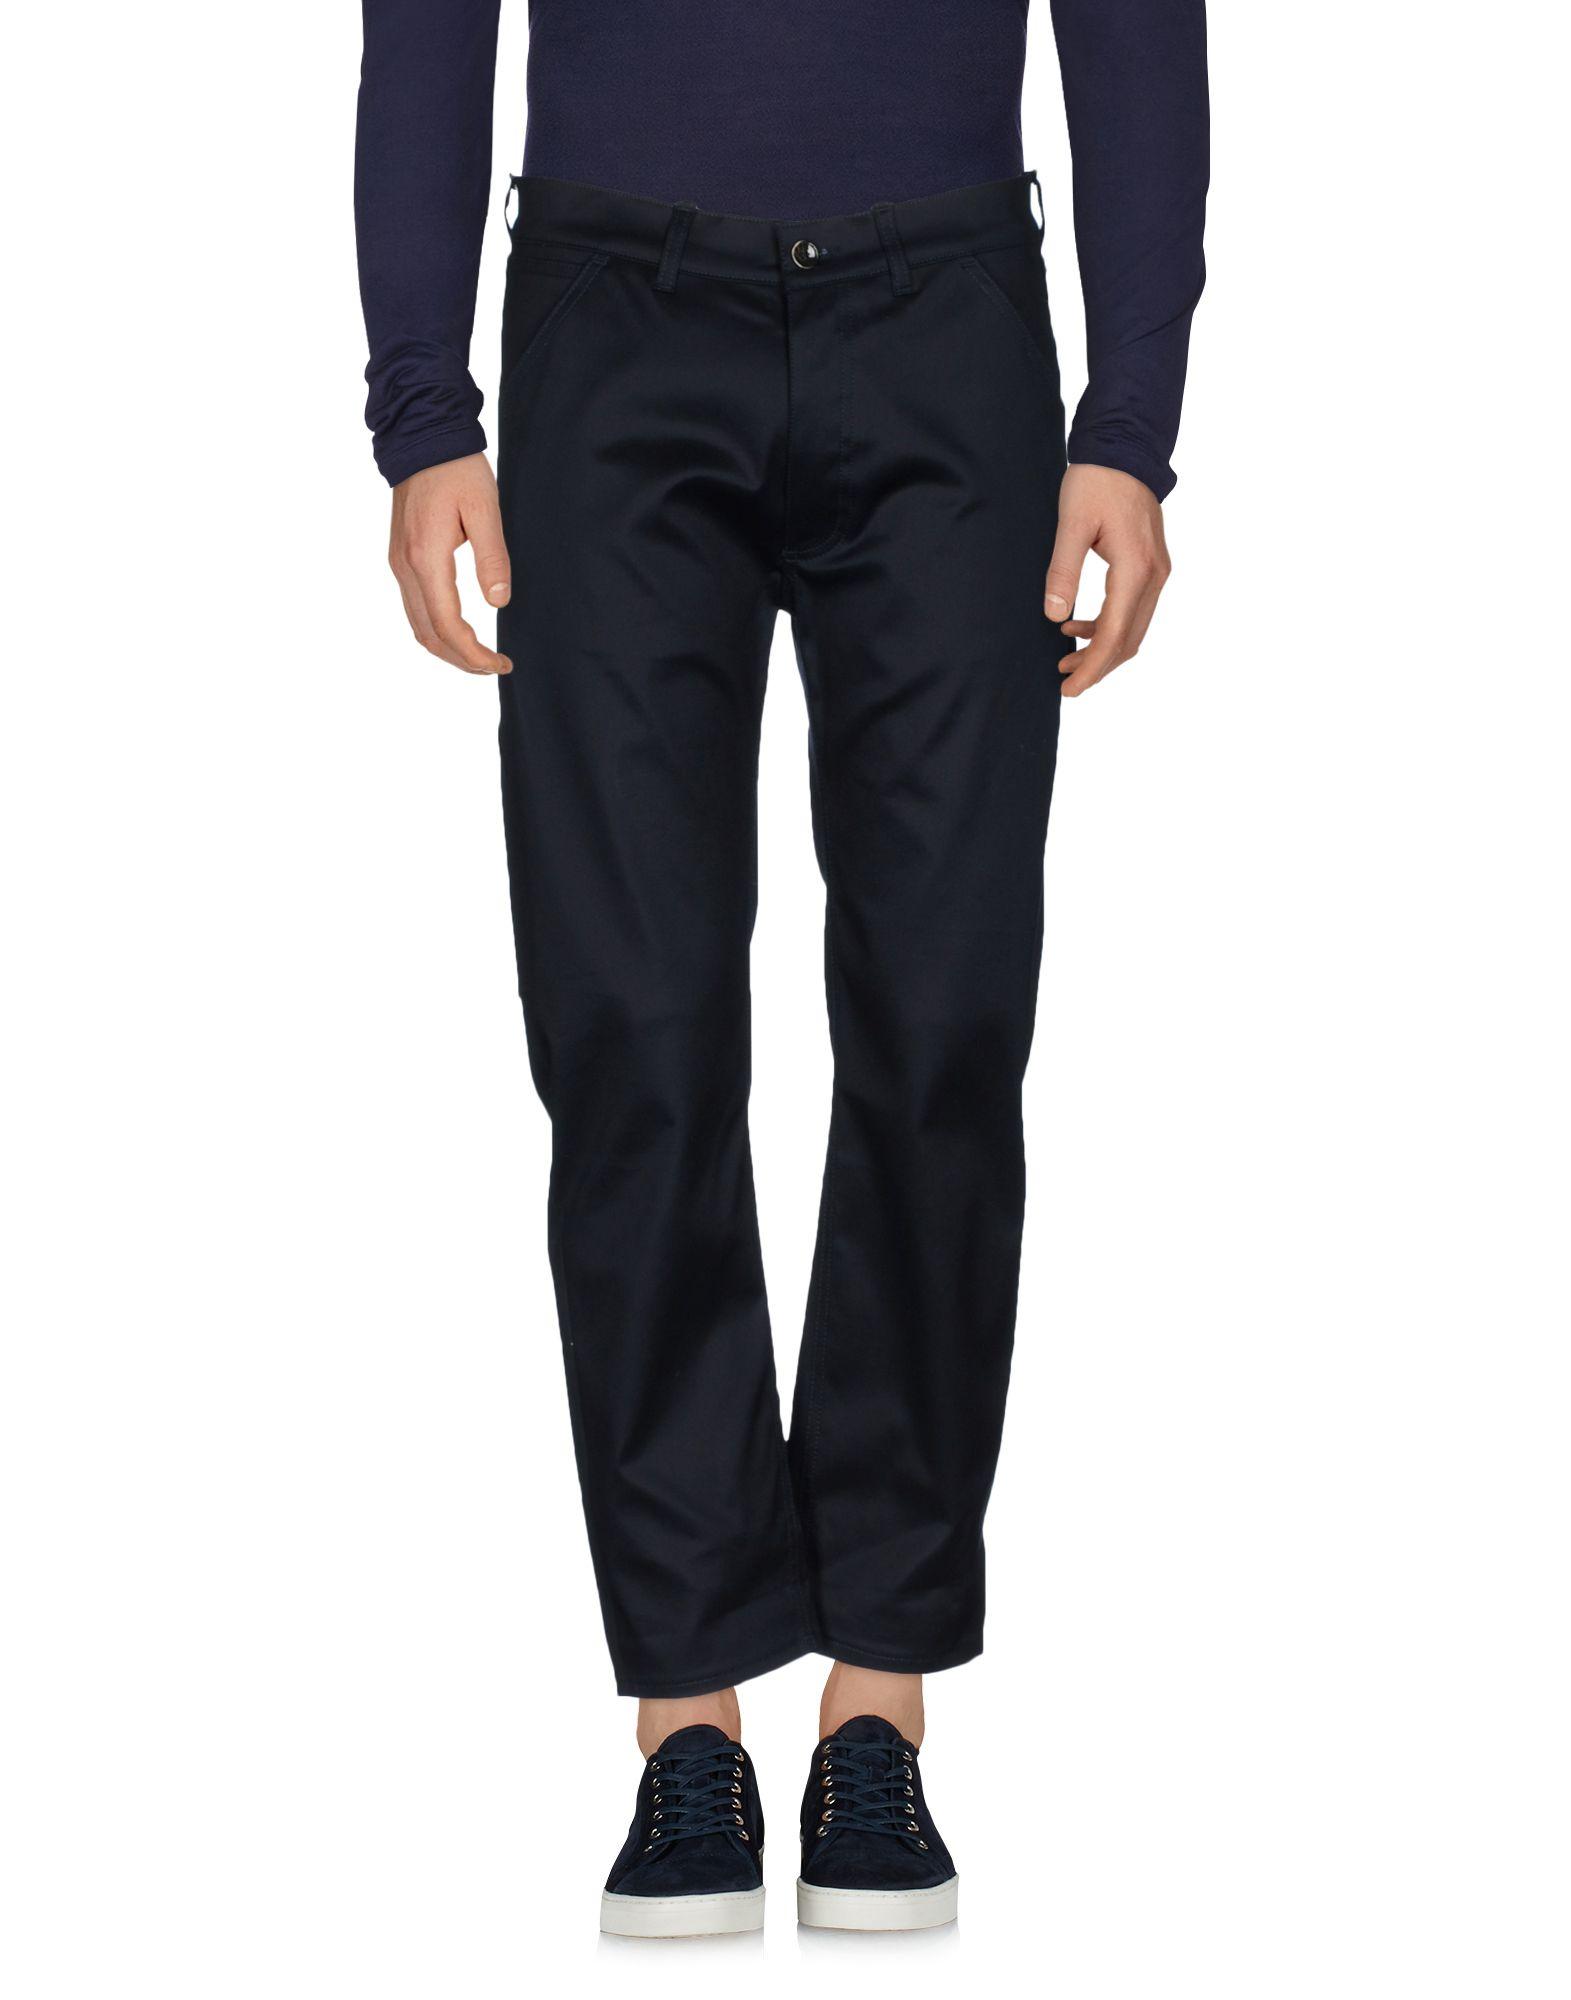 Pantalon en jean nine:inthe:morning homme. bleu...